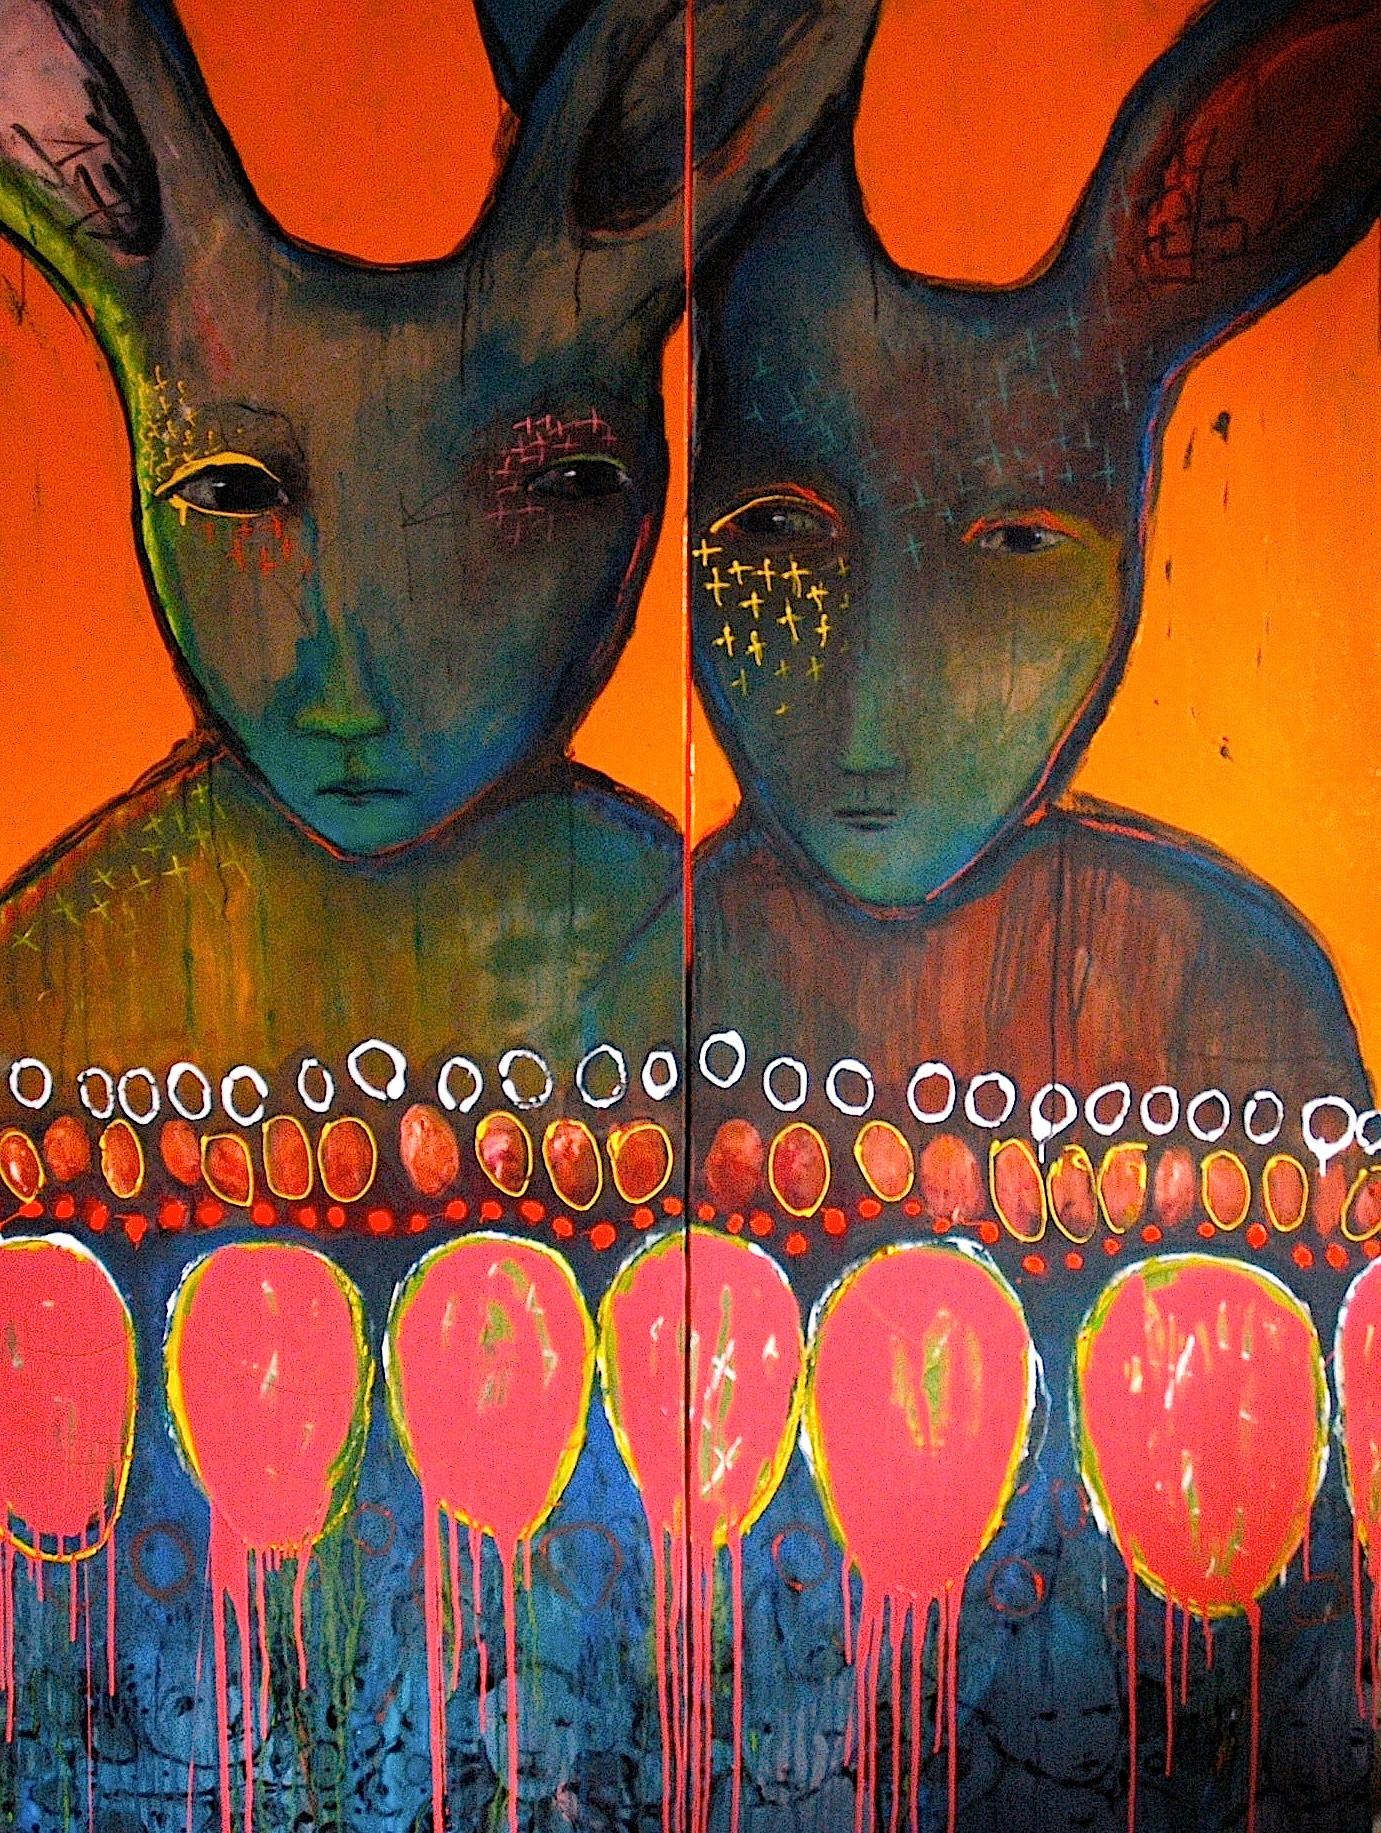 Jack Rabbit Coupling (Lania D'Agostino)